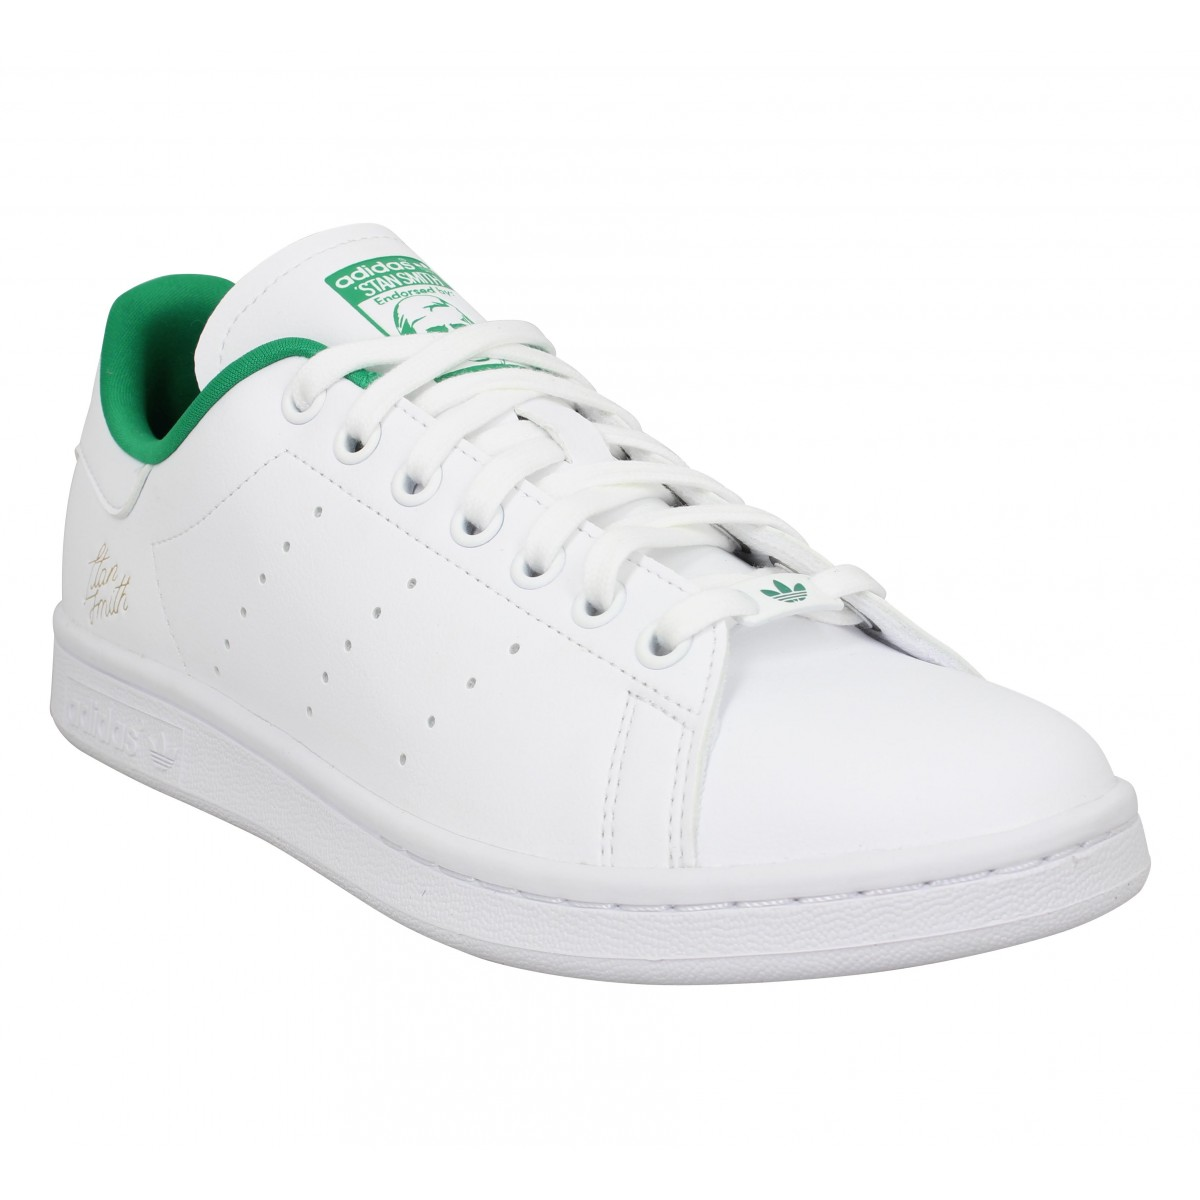 Baskets ADIDAS Stan Smith primegreen Homme Blanc Vert